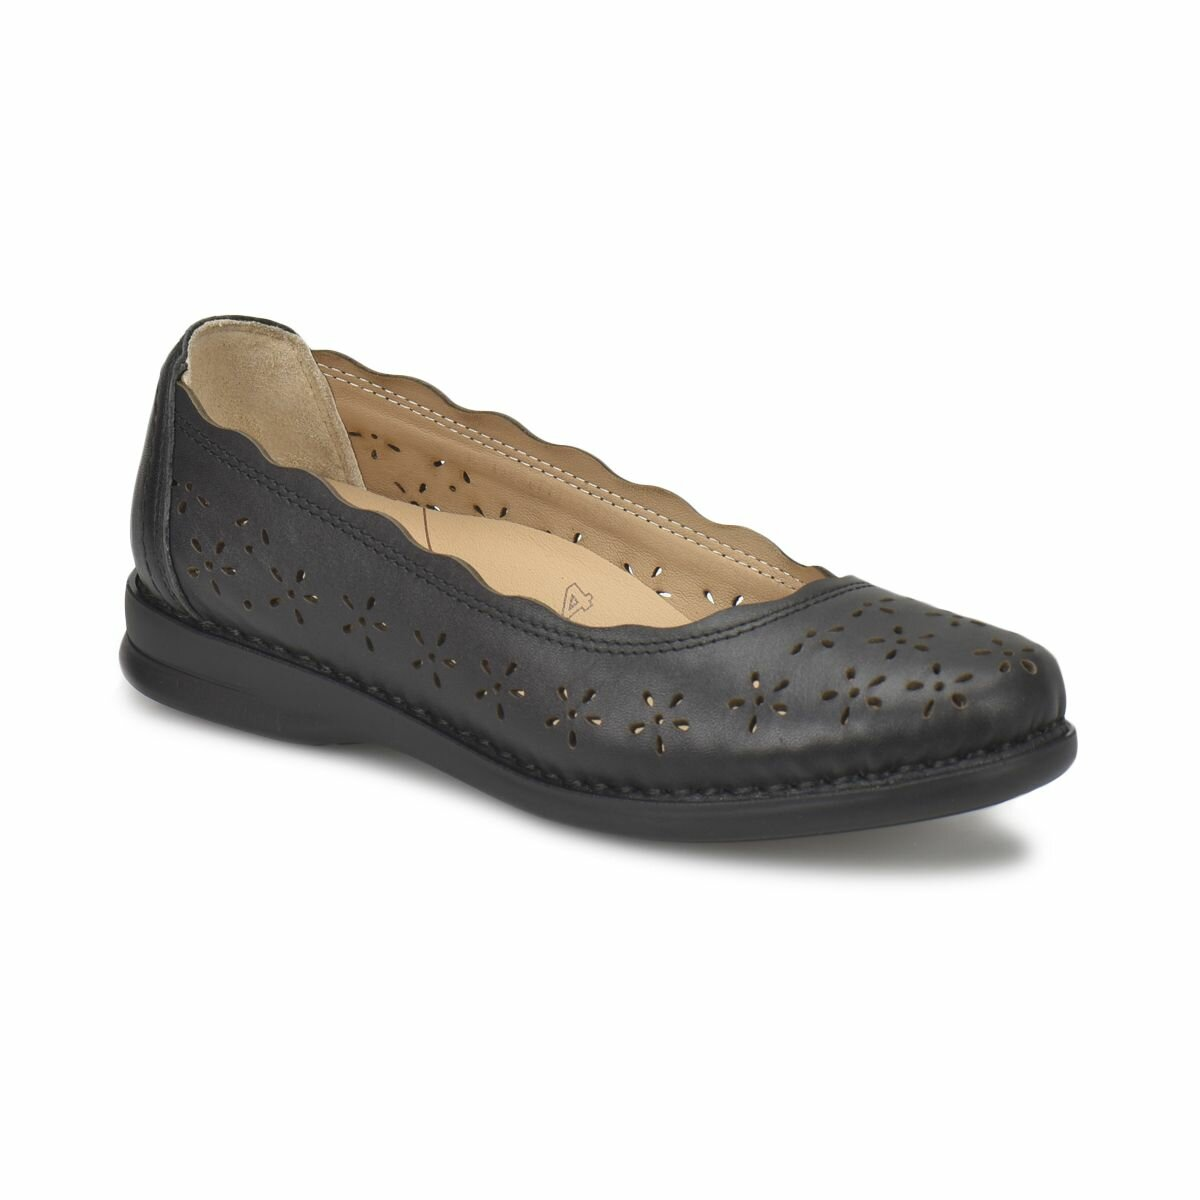 FLO 81.111091.Z Black Women Shoes Polaris 5 Point